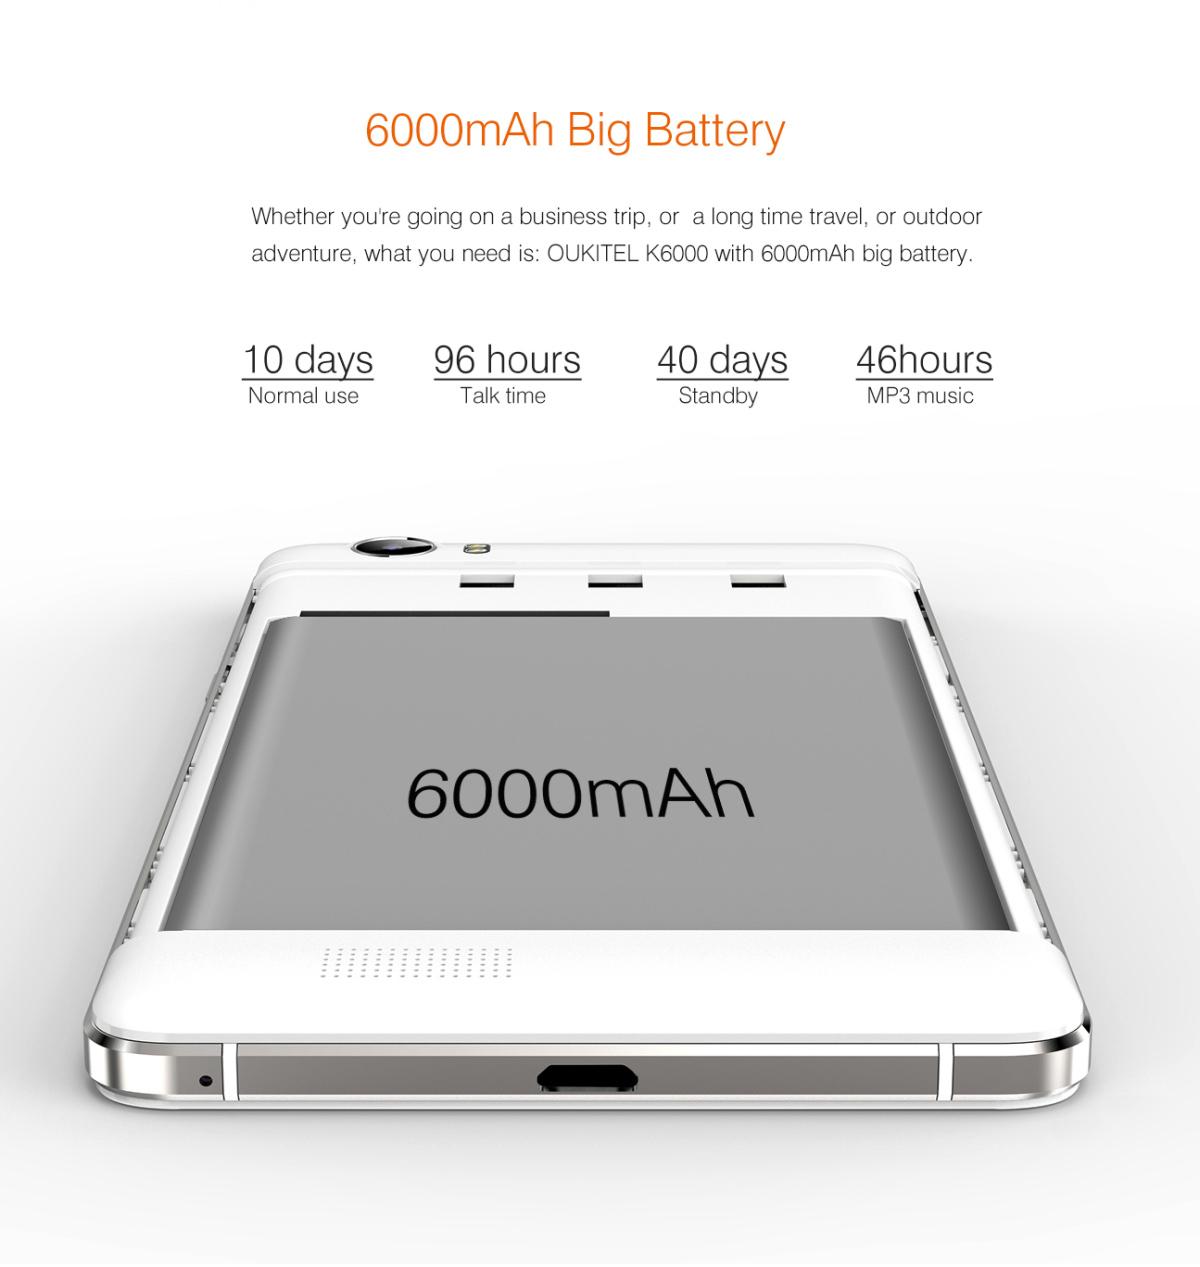 OUKITEL K6000, Test, Antutu, Akku Test, Akku Laufzeit, Smartphone ohne Vertrag, Smartphones günstig, China Smartphone